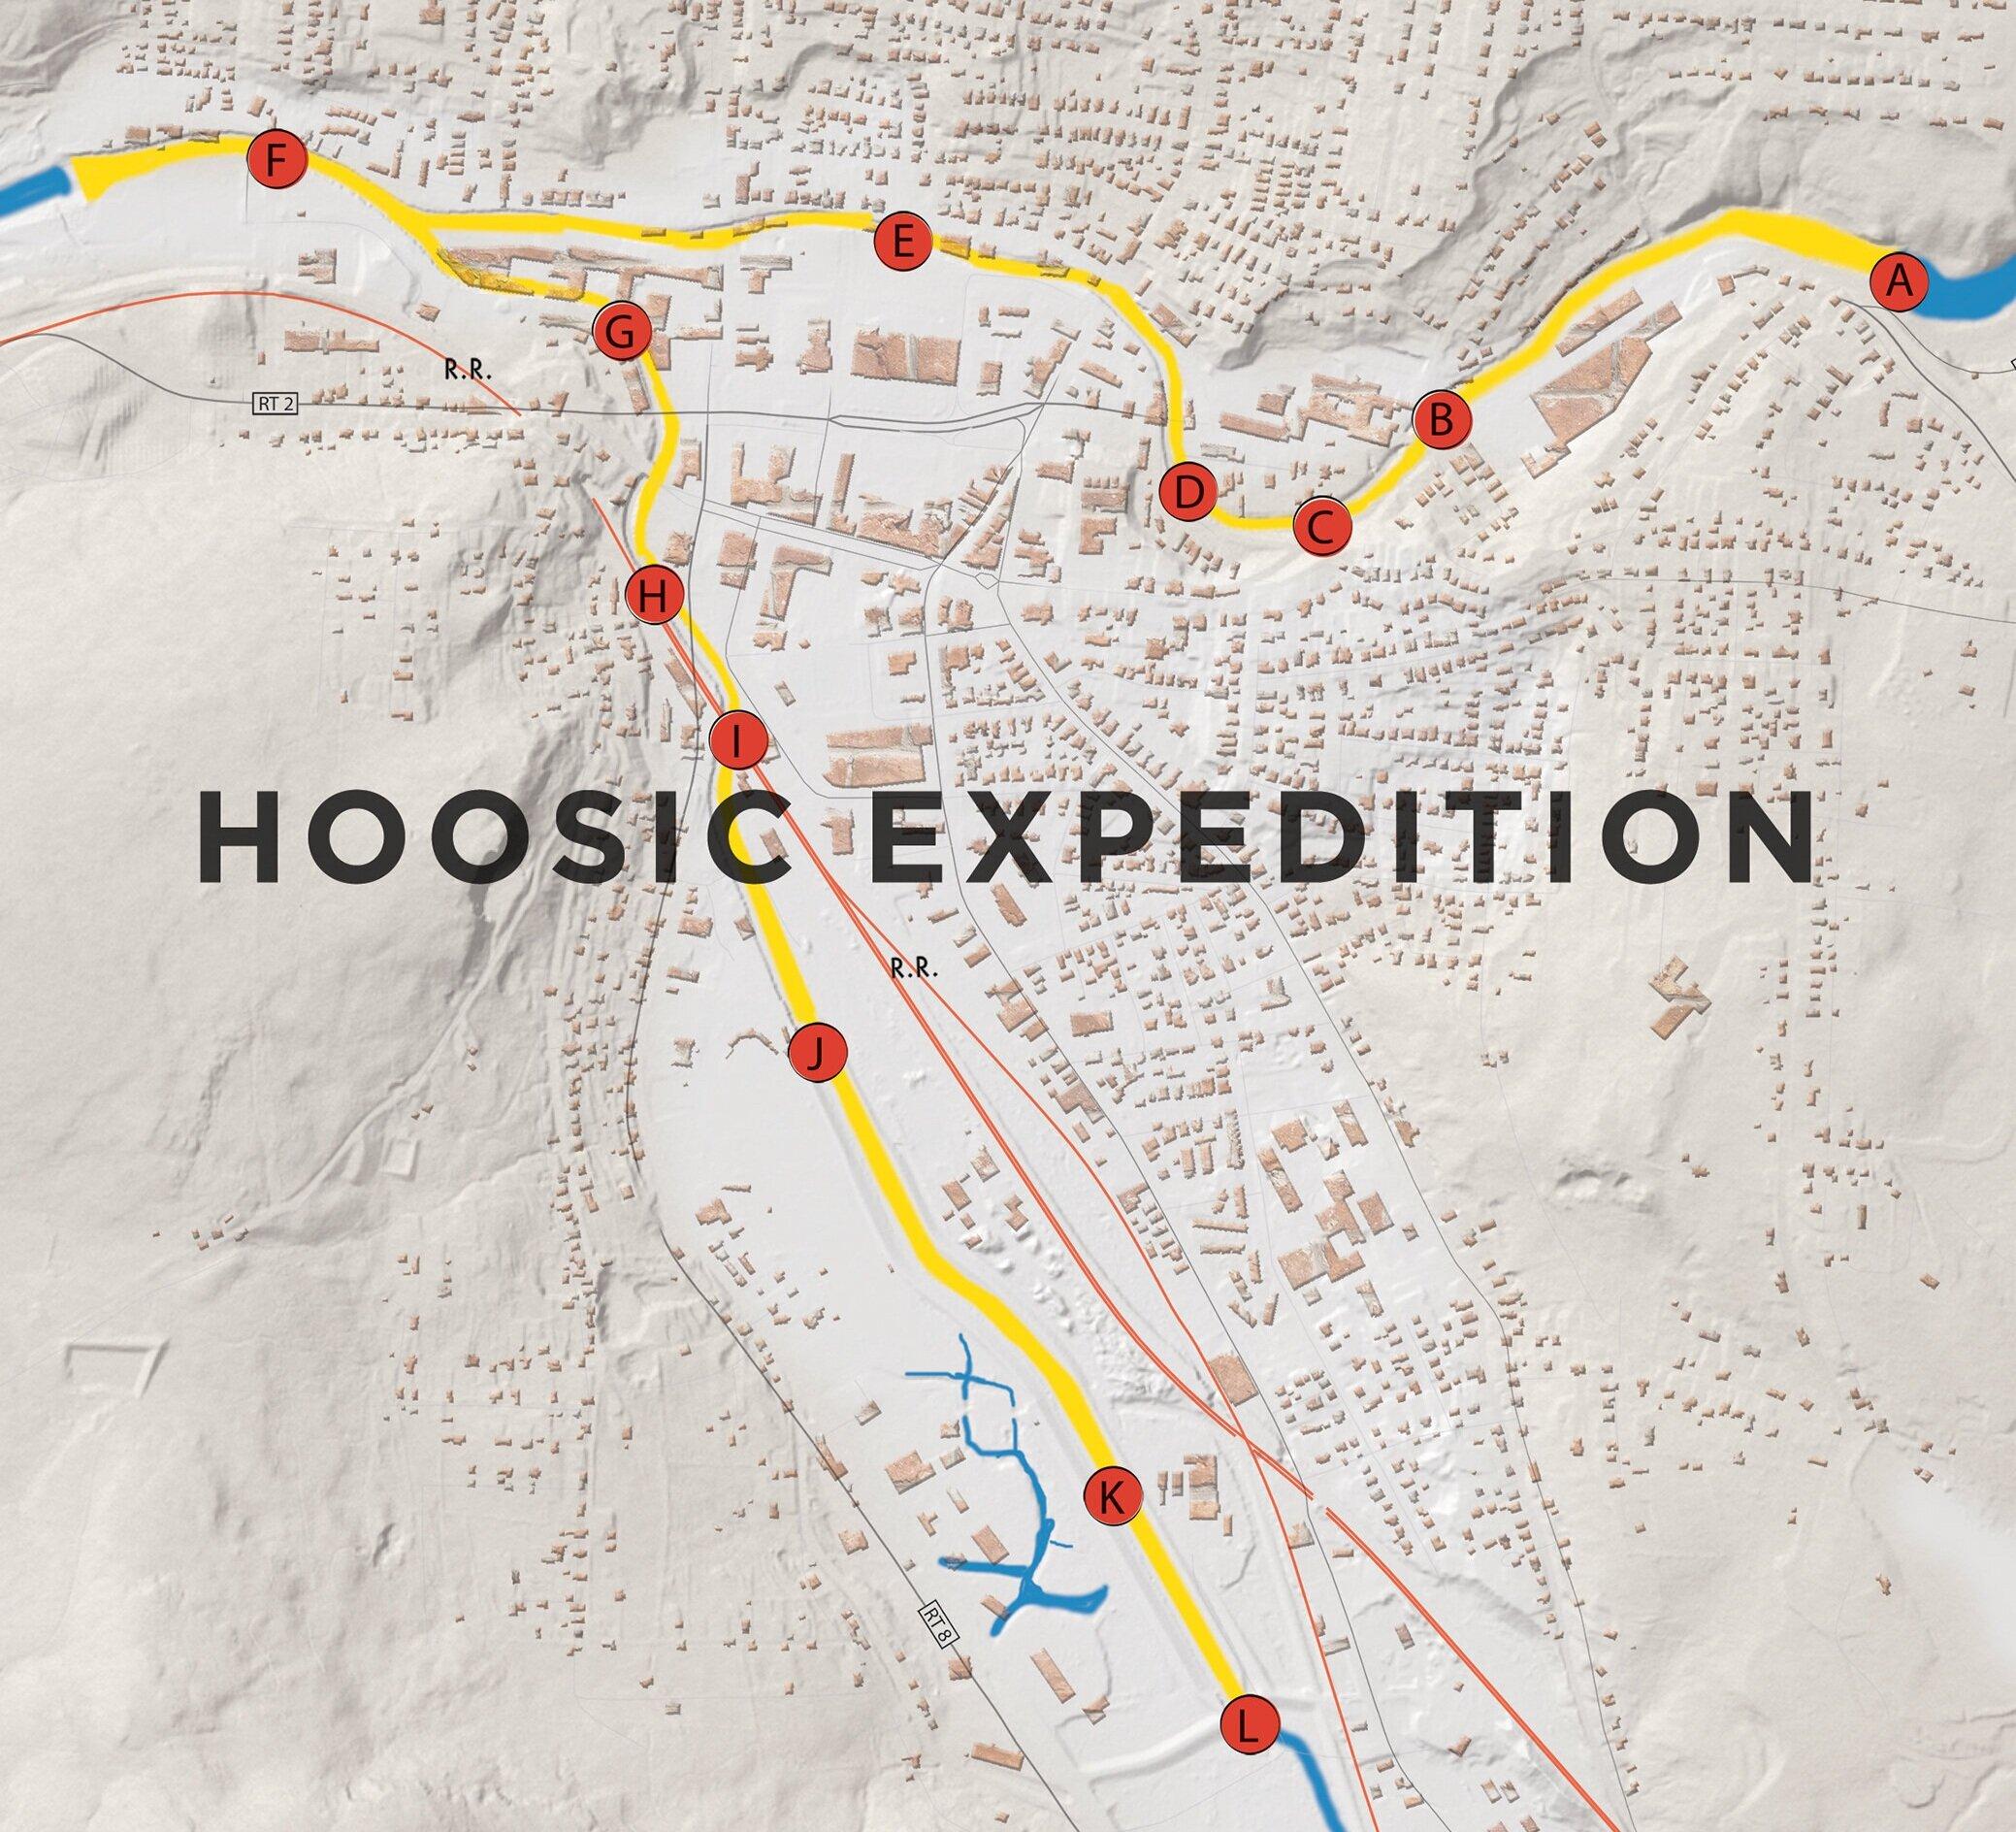 David Buckley Borden Hoosic Expedition